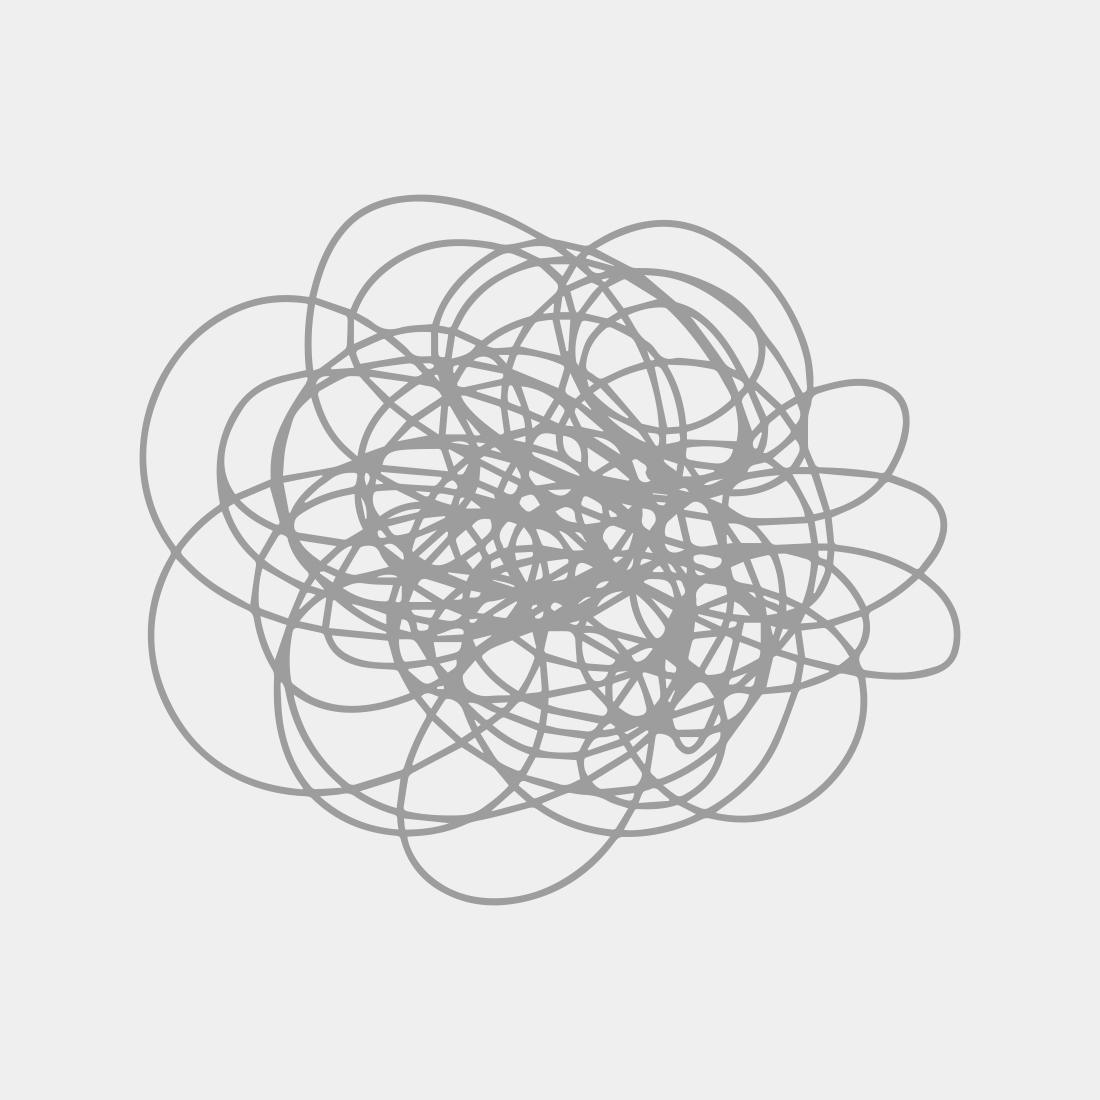 Albert Irvin OBE RA Untitled opus w.5 (framed)